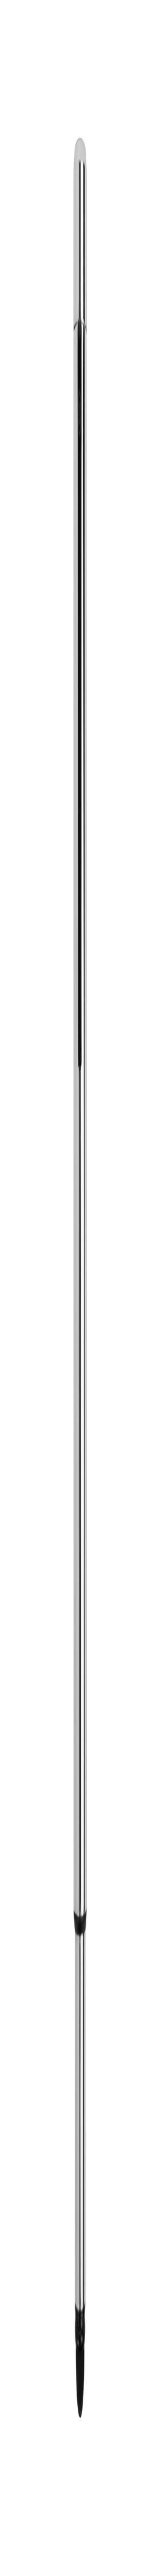 Ручка с флешкой GENIUS, 4 Гб фото